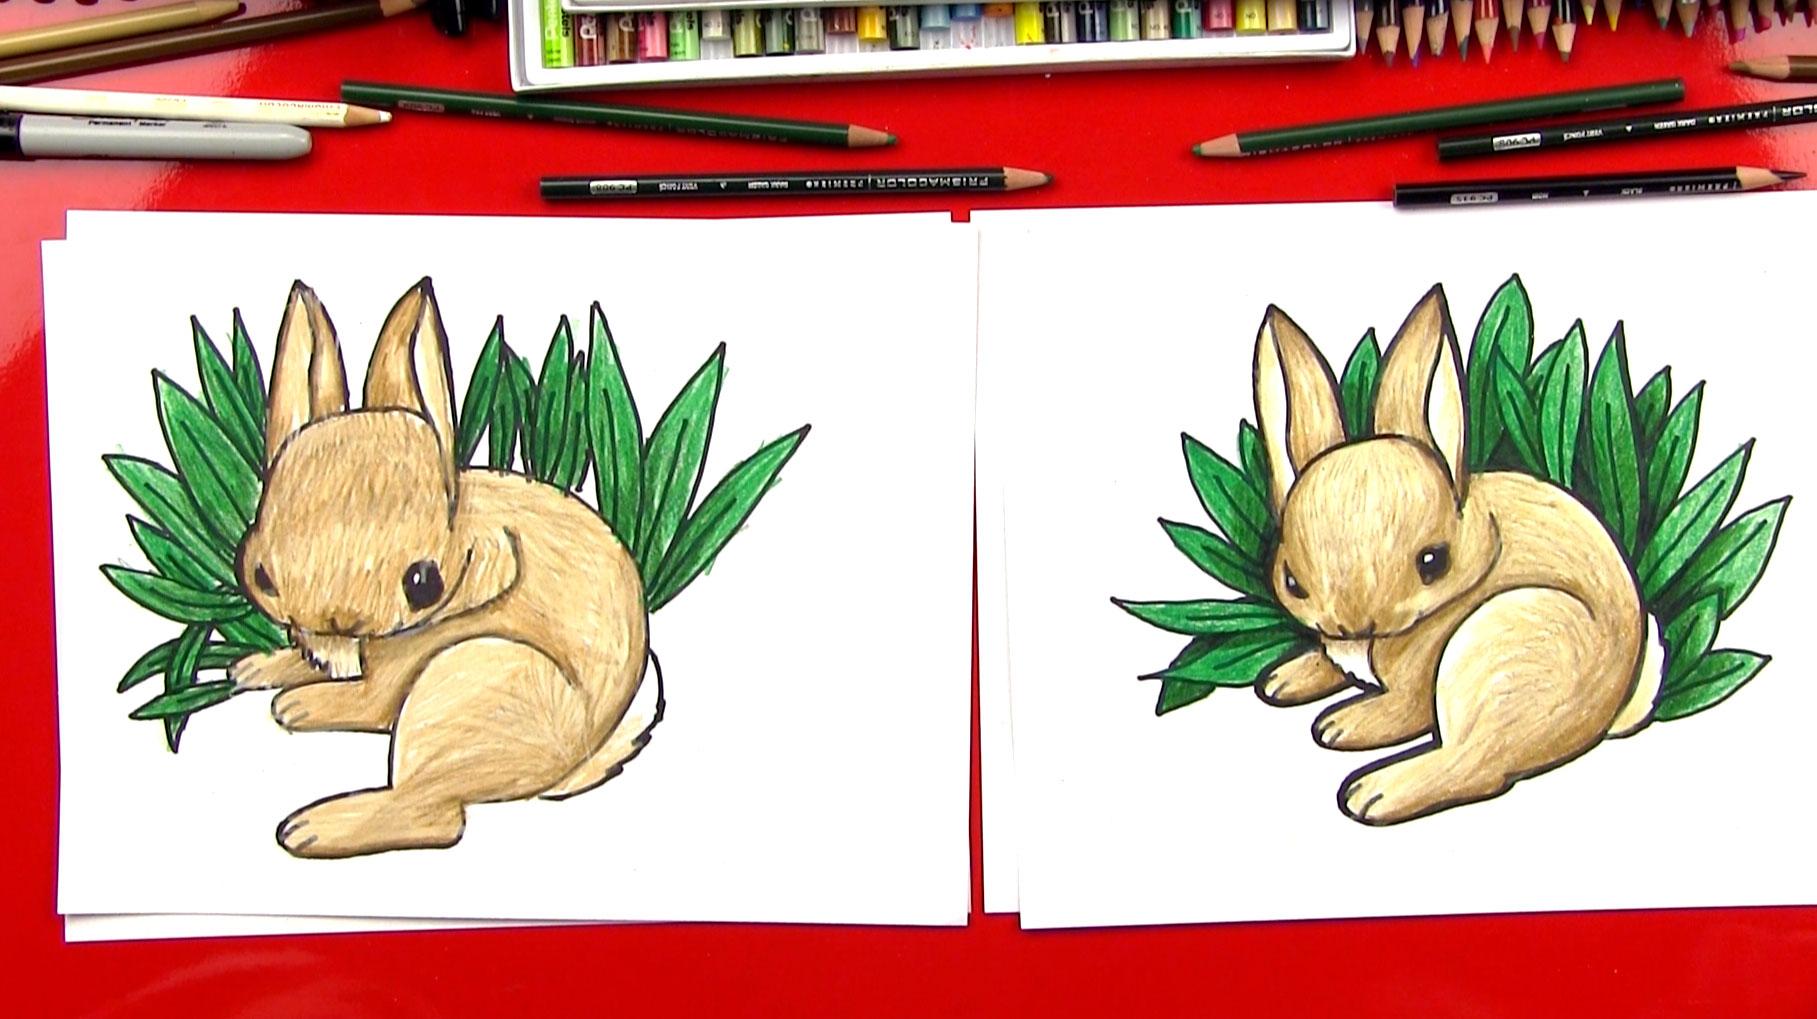 Drawn rabbit art for kid hub Draw A  For Hub